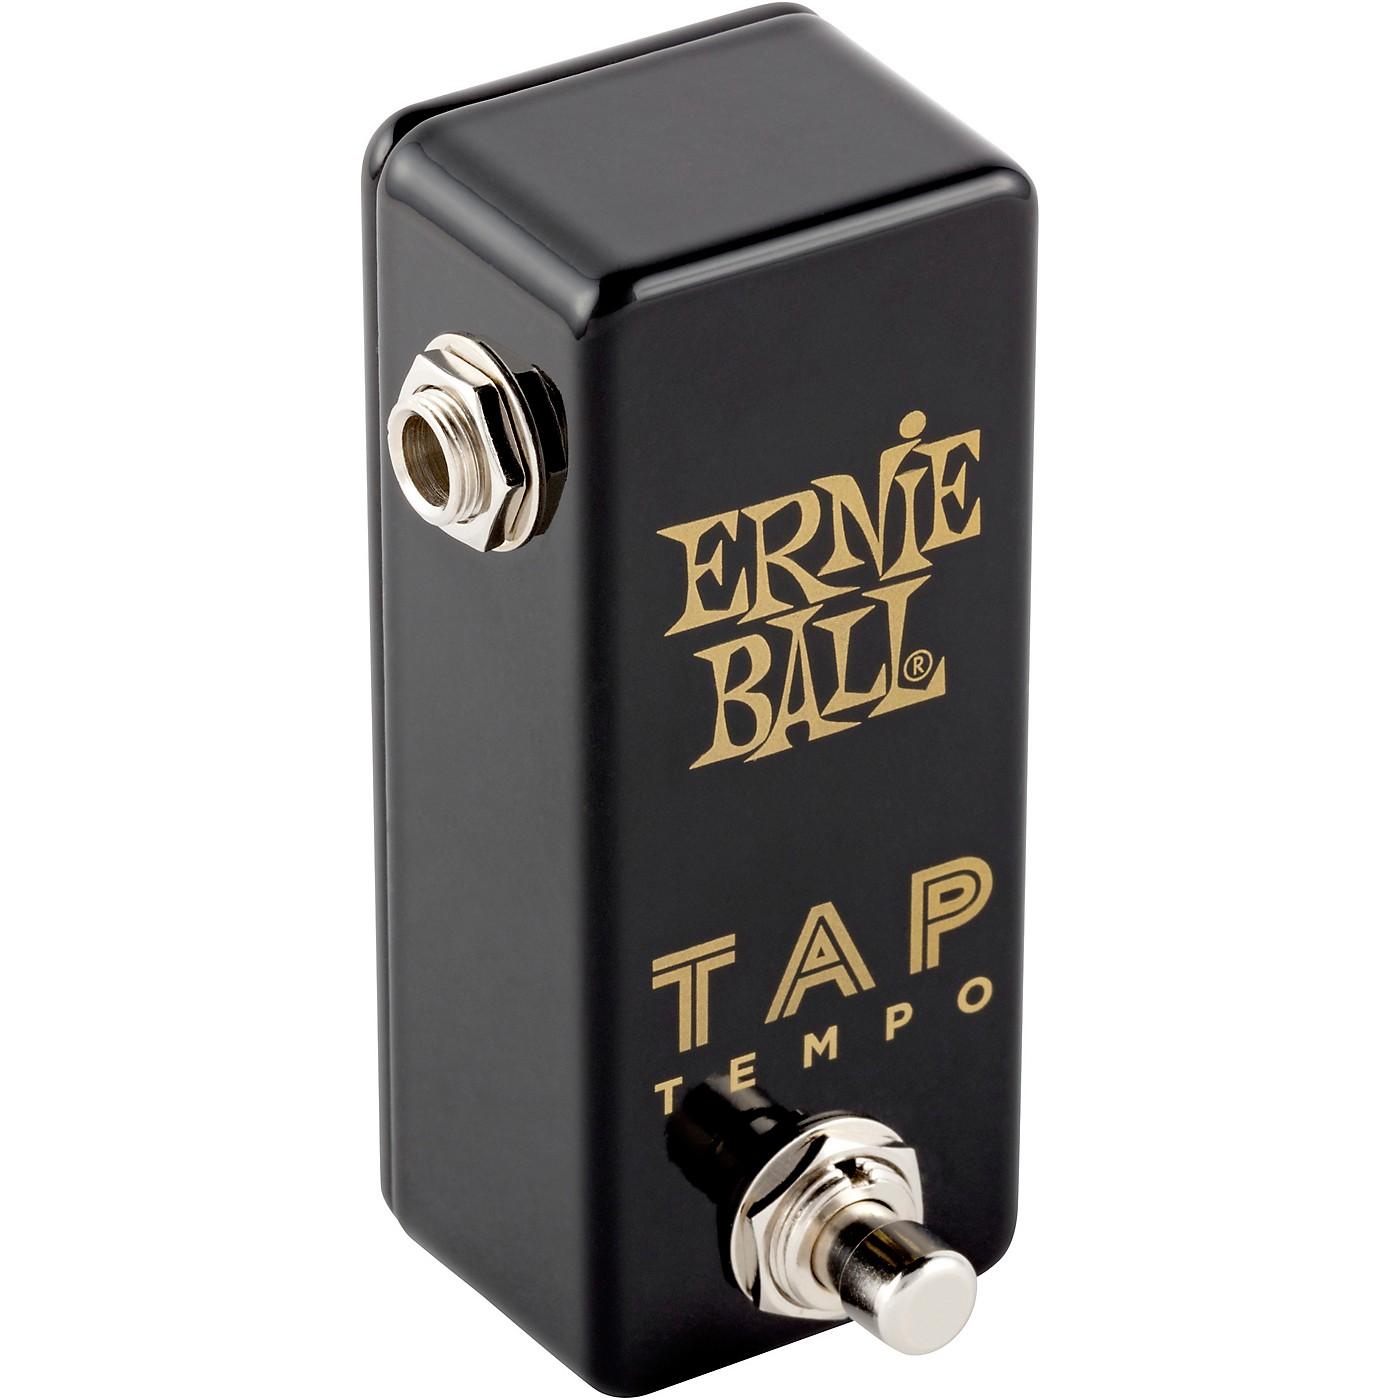 Ernie Ball Tap Tempo Pedal thumbnail